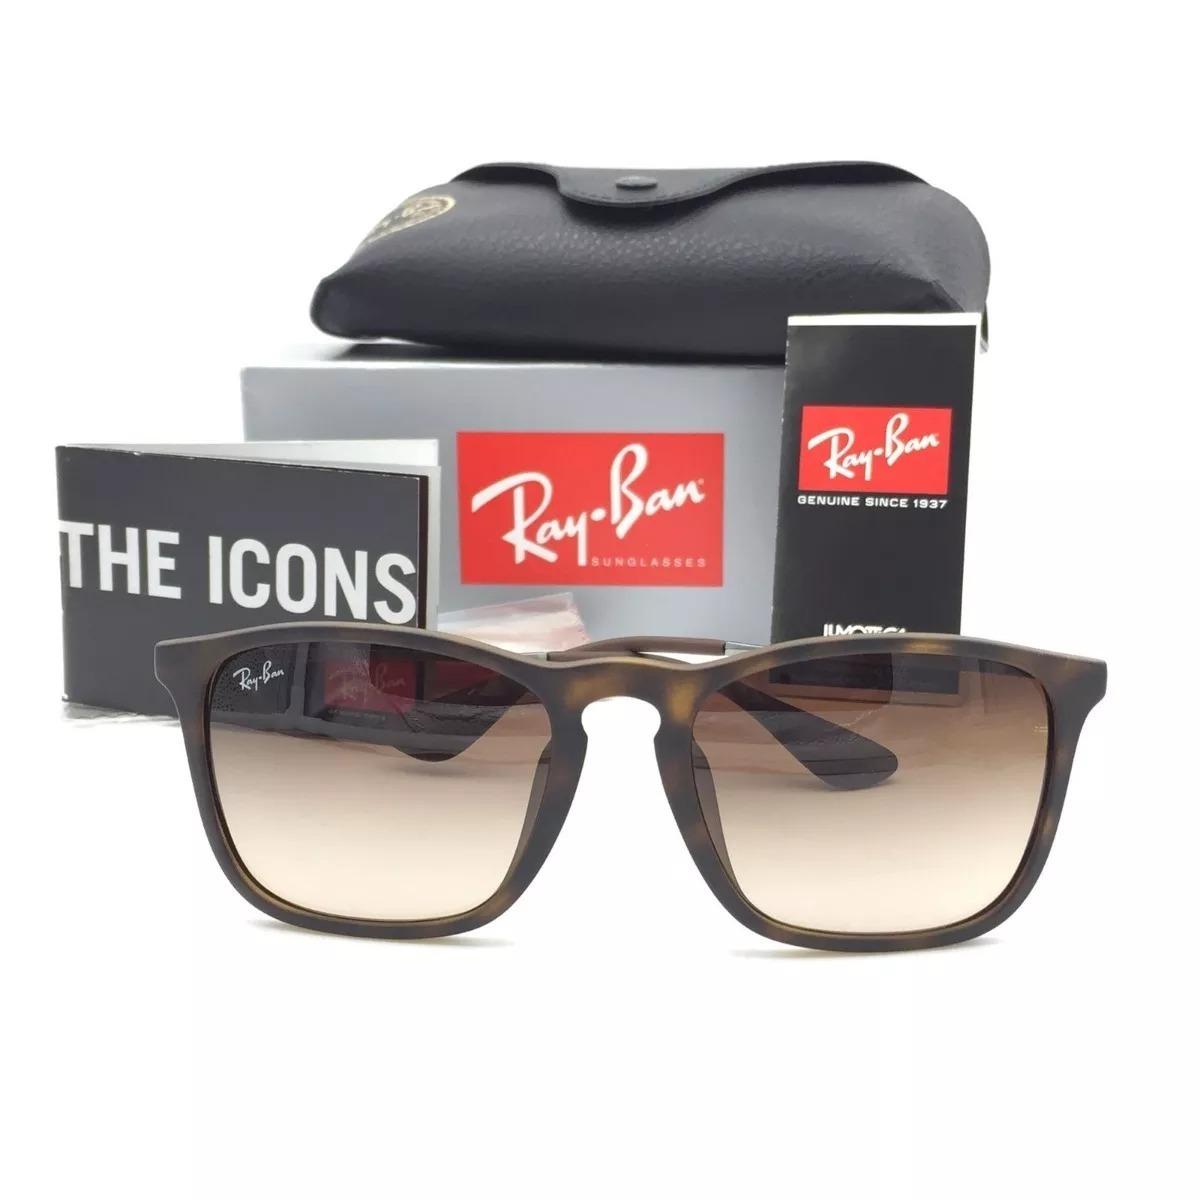 179aa759a629e óculos ray ban chris rb4187 original tartaruga black friday. Carregando zoom .